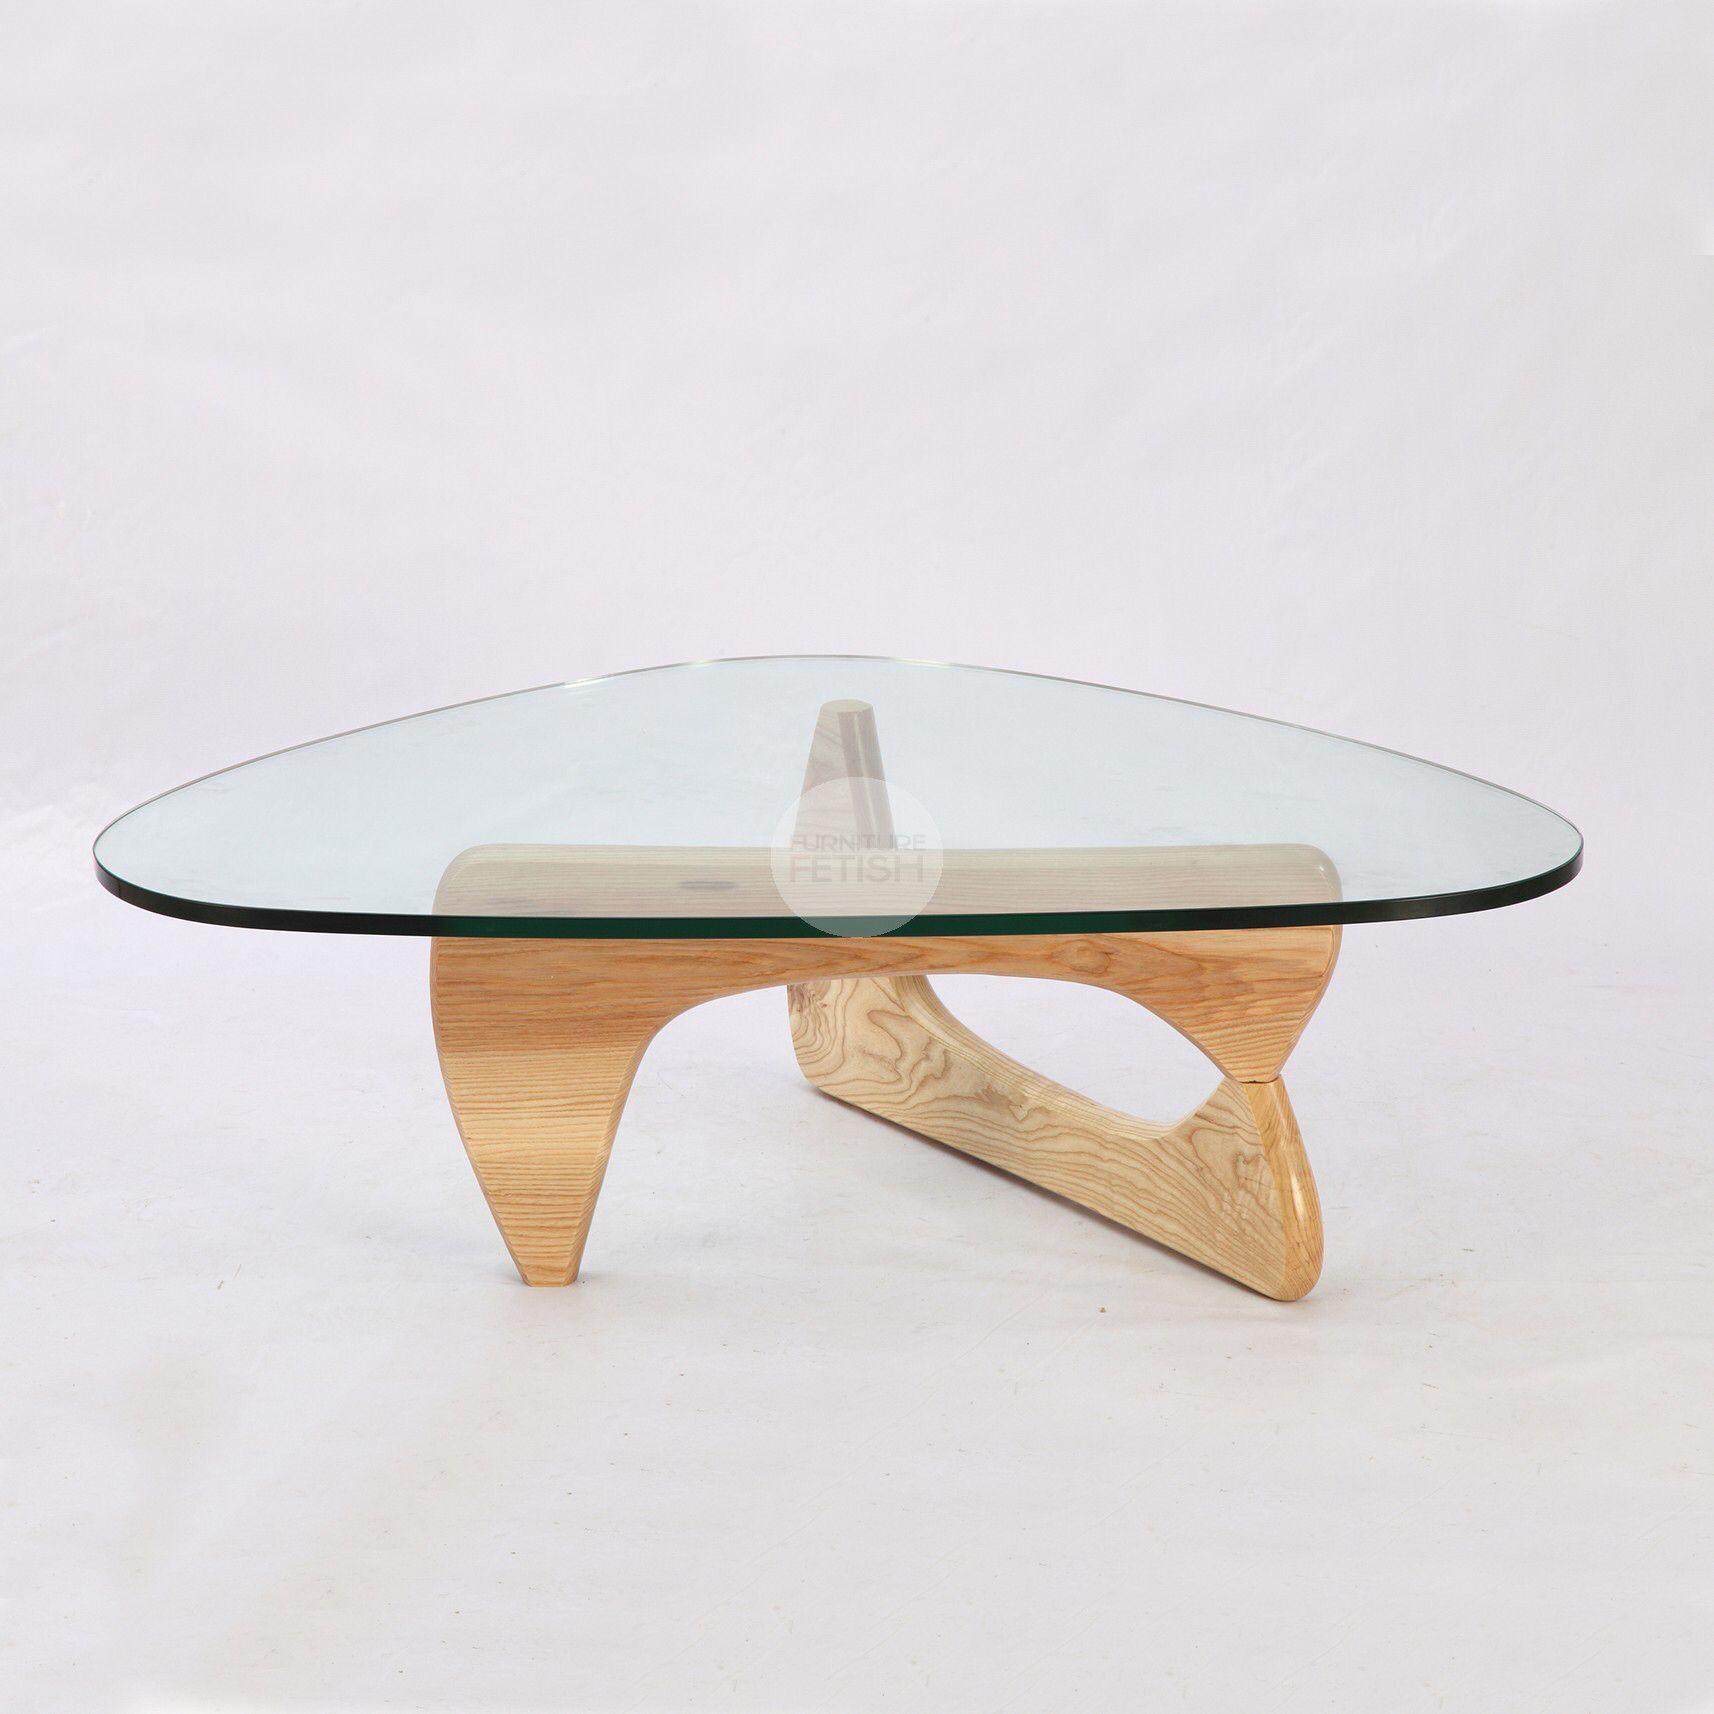 Replica Isamu Noguchi Coffee Table Blonde Natural Noguchi Coffee Table Coffee Table Replica Furniture [ 1714 x 1714 Pixel ]